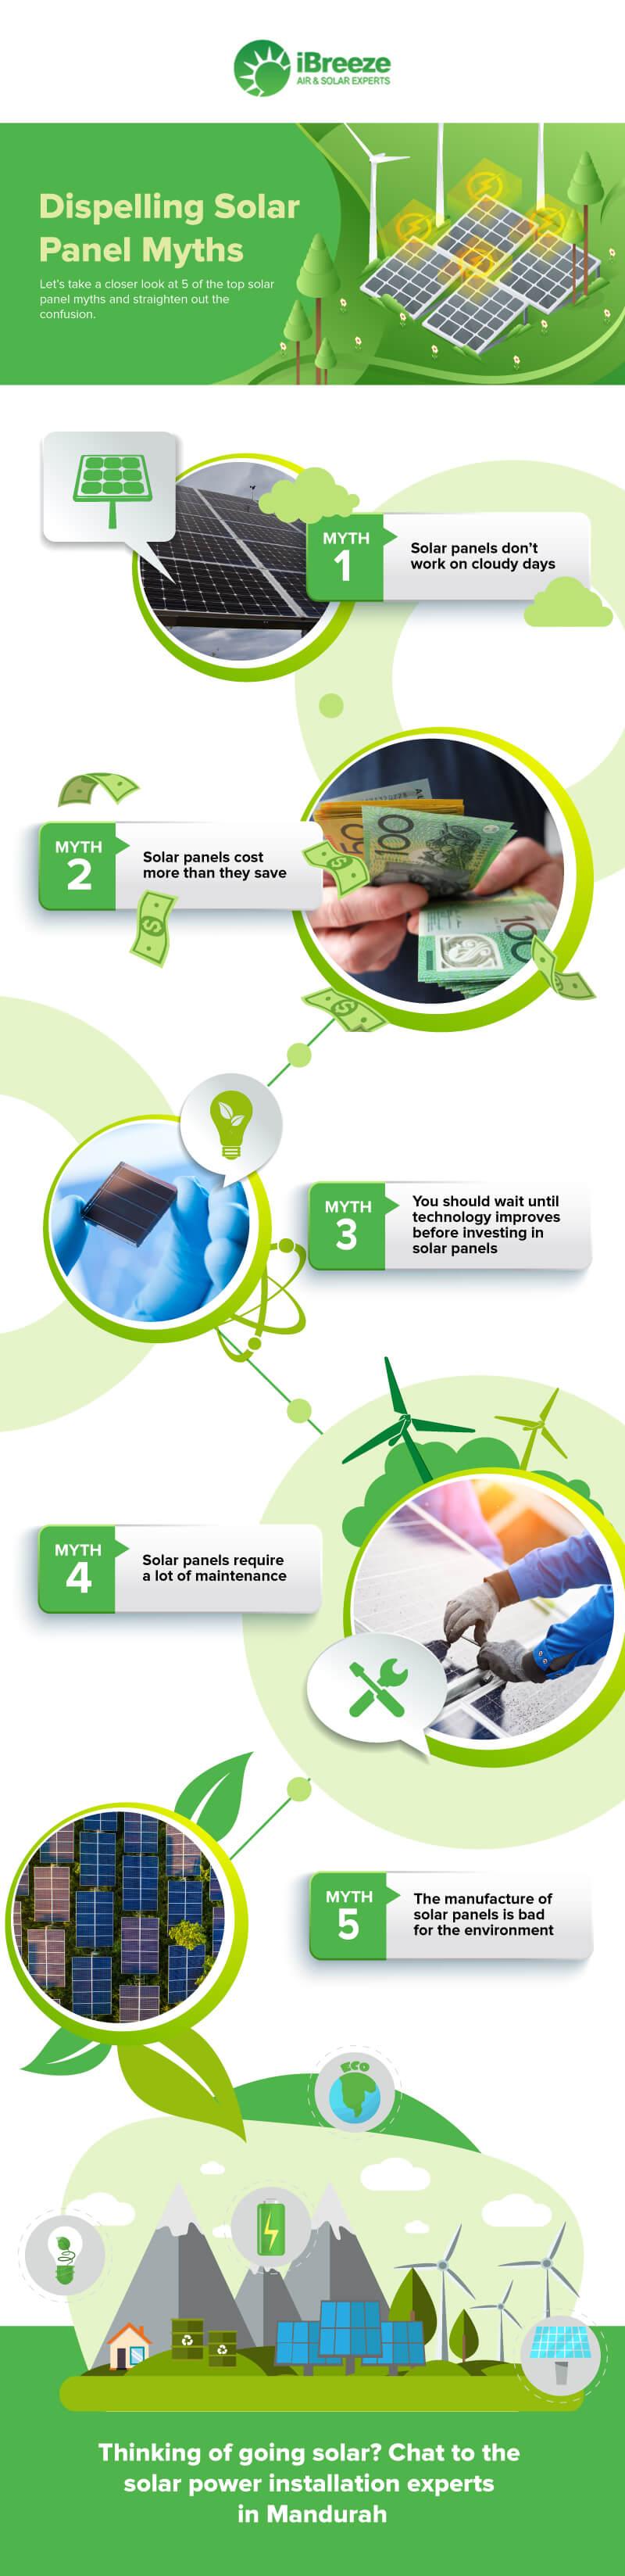 solar-panel-myths-infographic-plaza